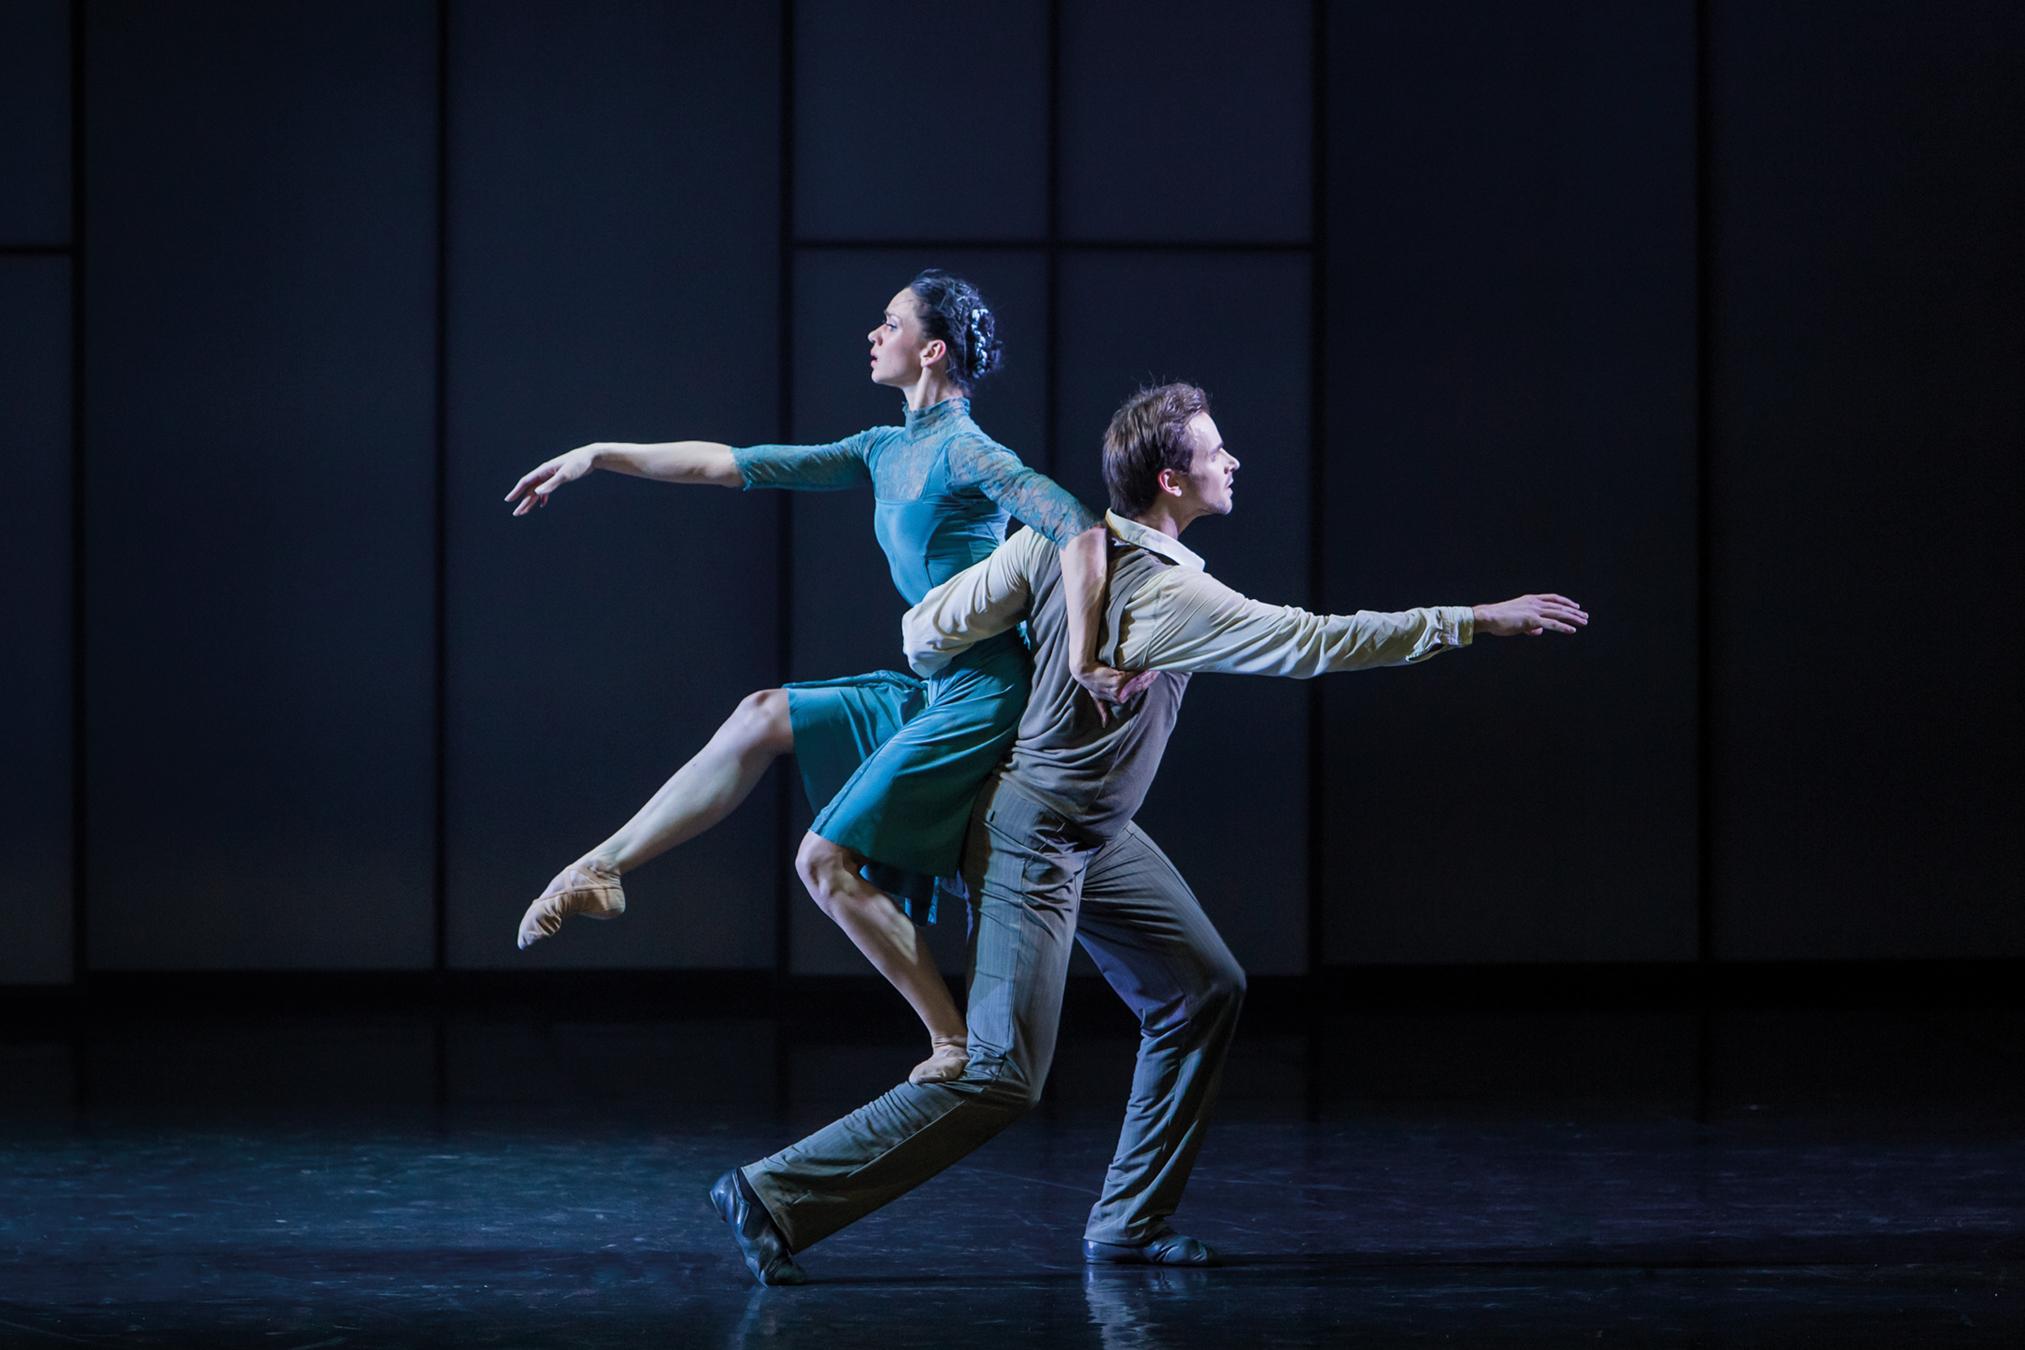 Театр балета Бориса Эйфмана начинает гастроли в Израиле